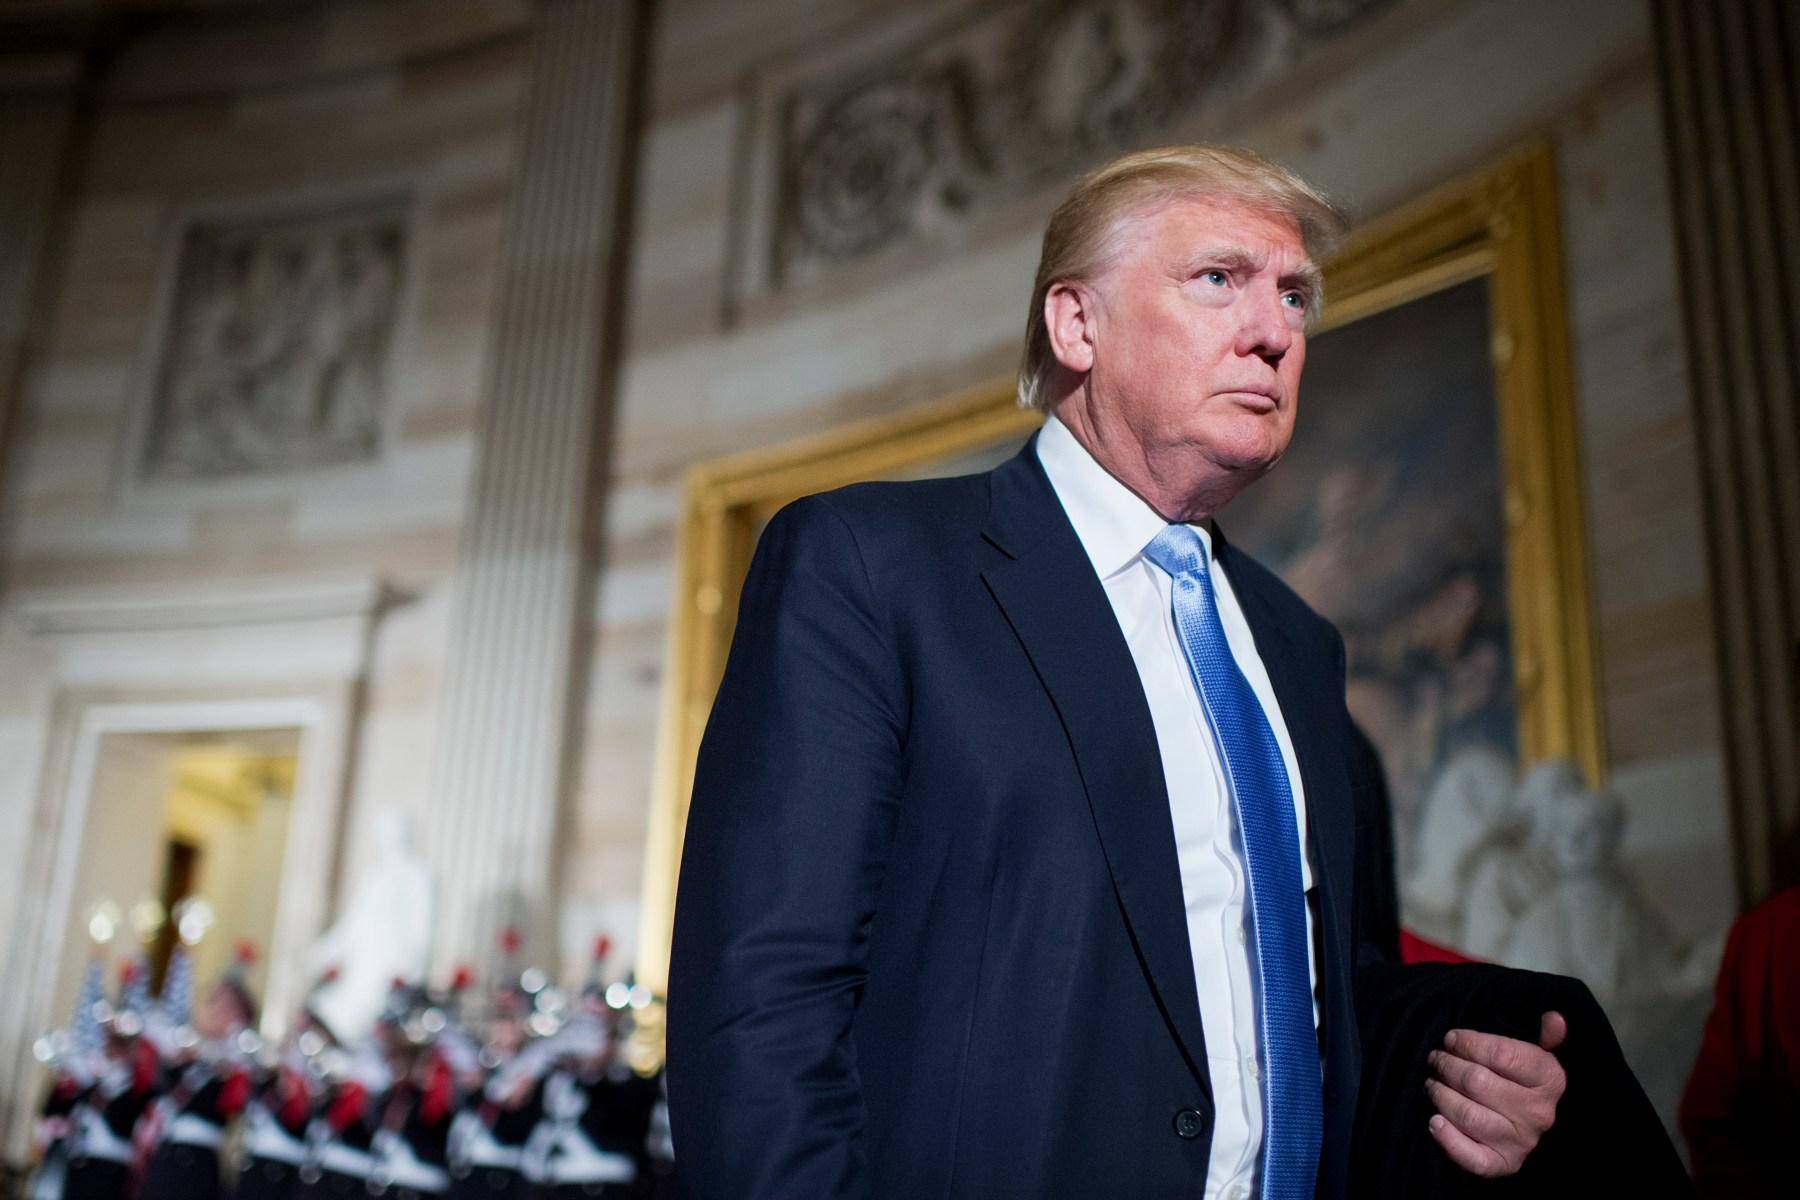 DONALD TRUMP PLAQUE PRESIDENT CANDIDATE MAKE AMERICA GREAT AGAIN